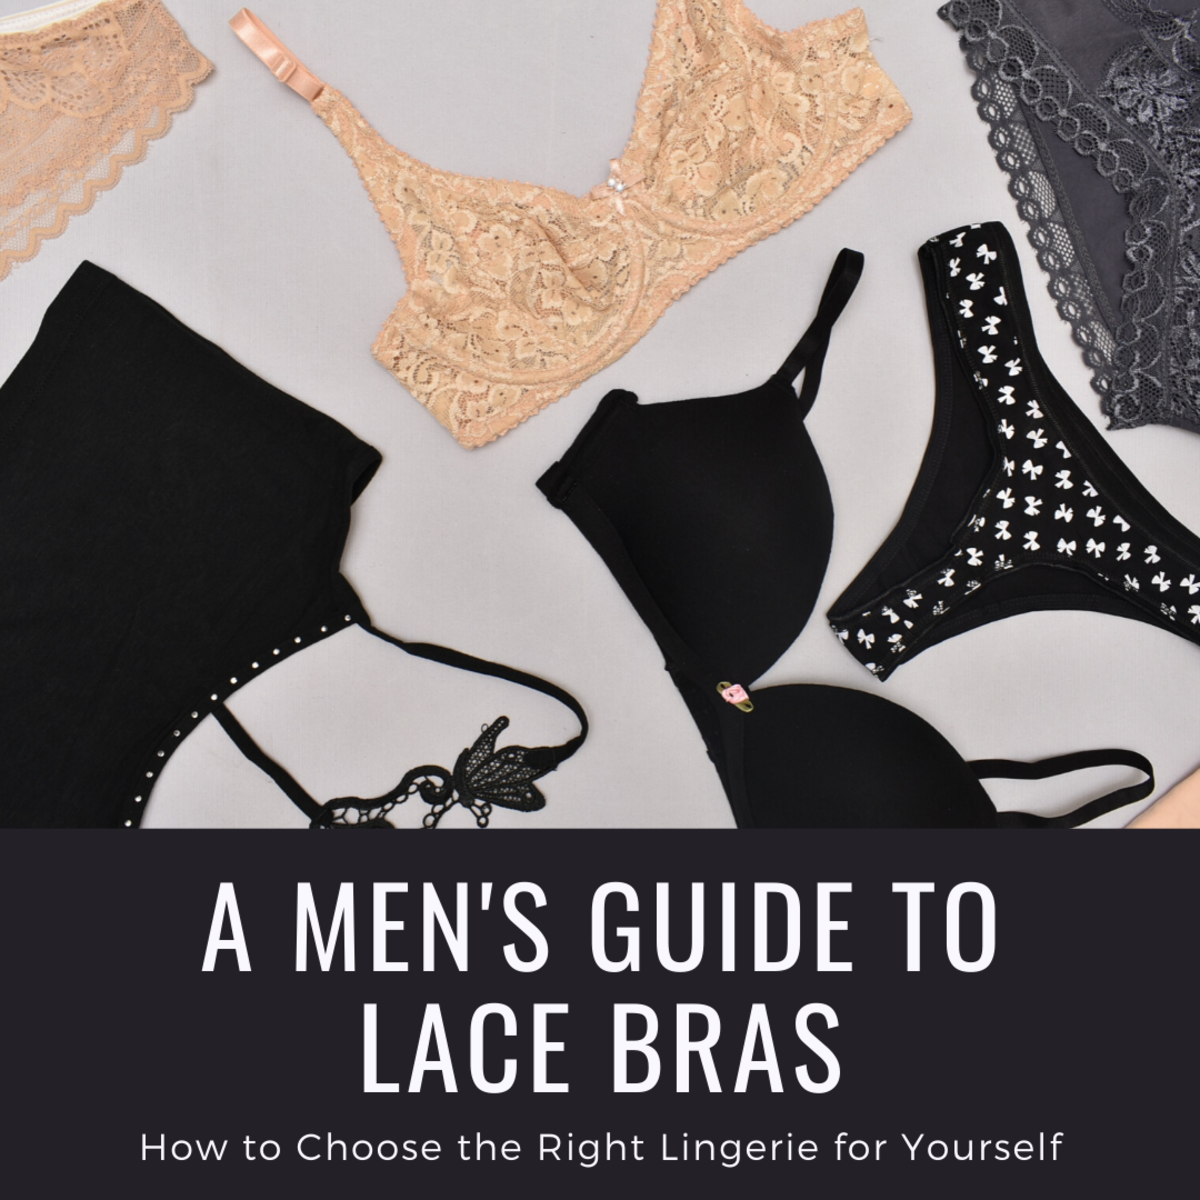 Men in Lingerie: Lace Bras for Men